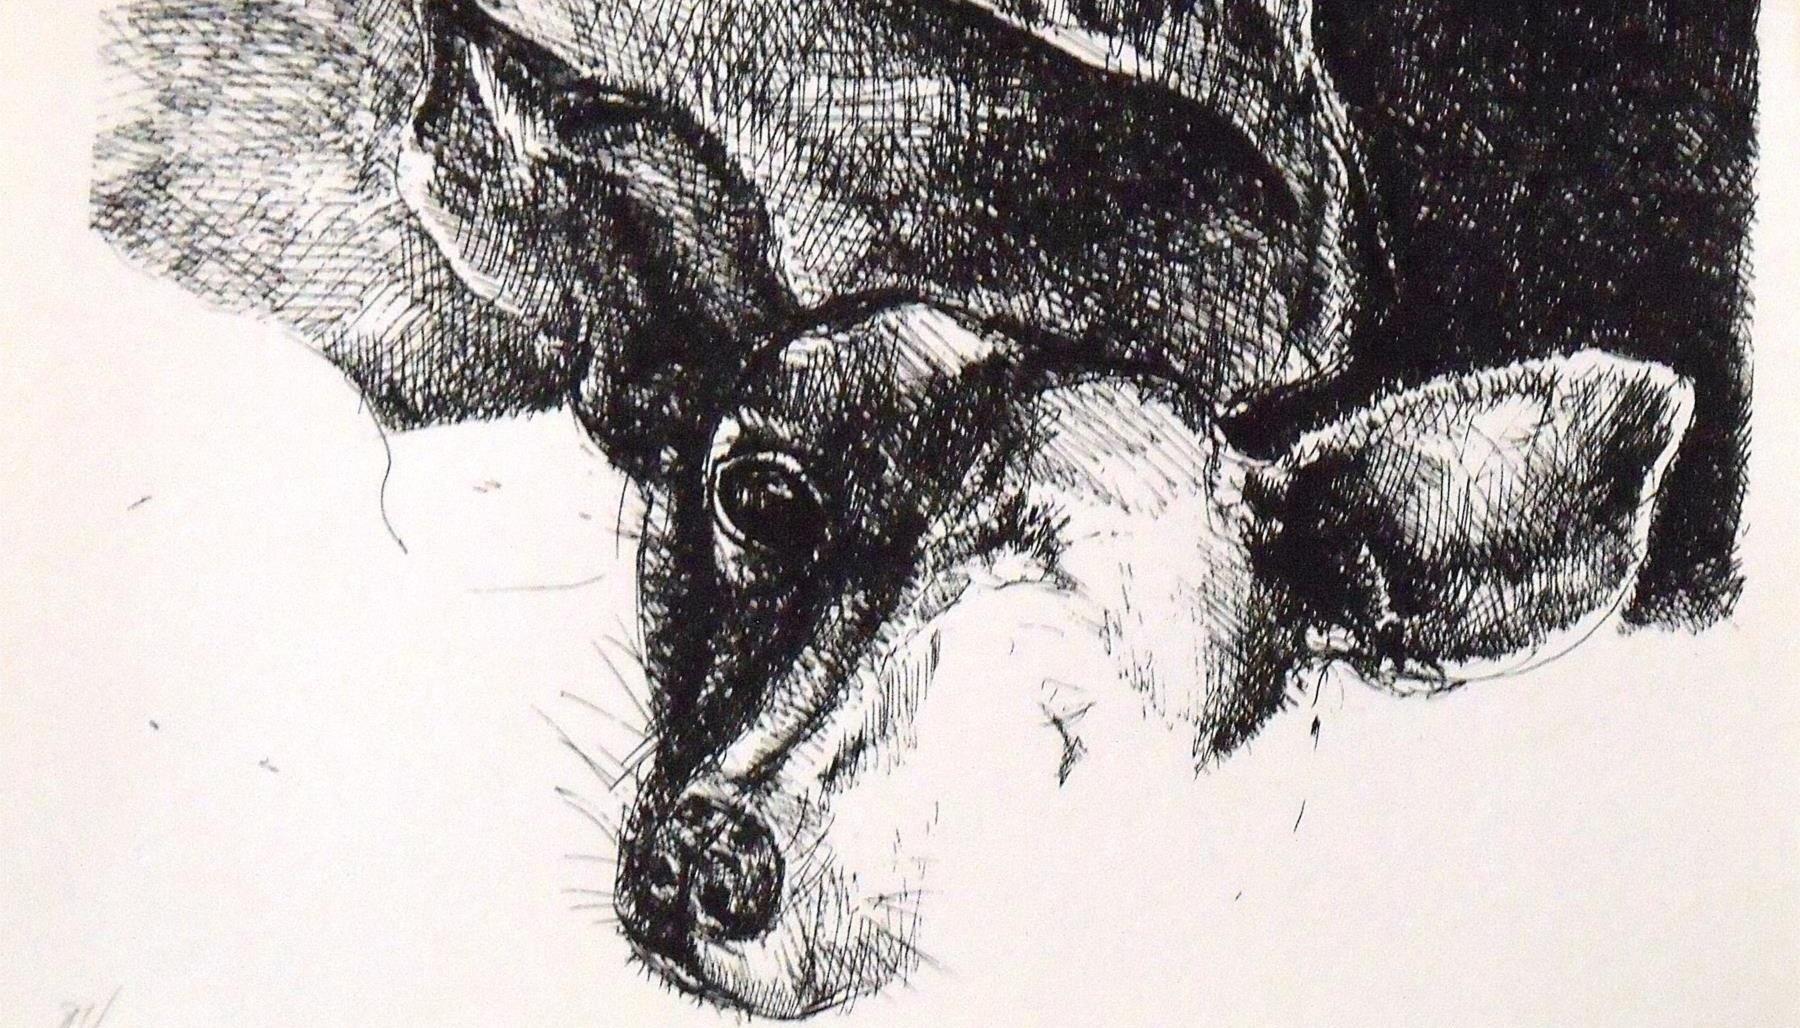 Animaladas pictóricas: las mascotas del arte